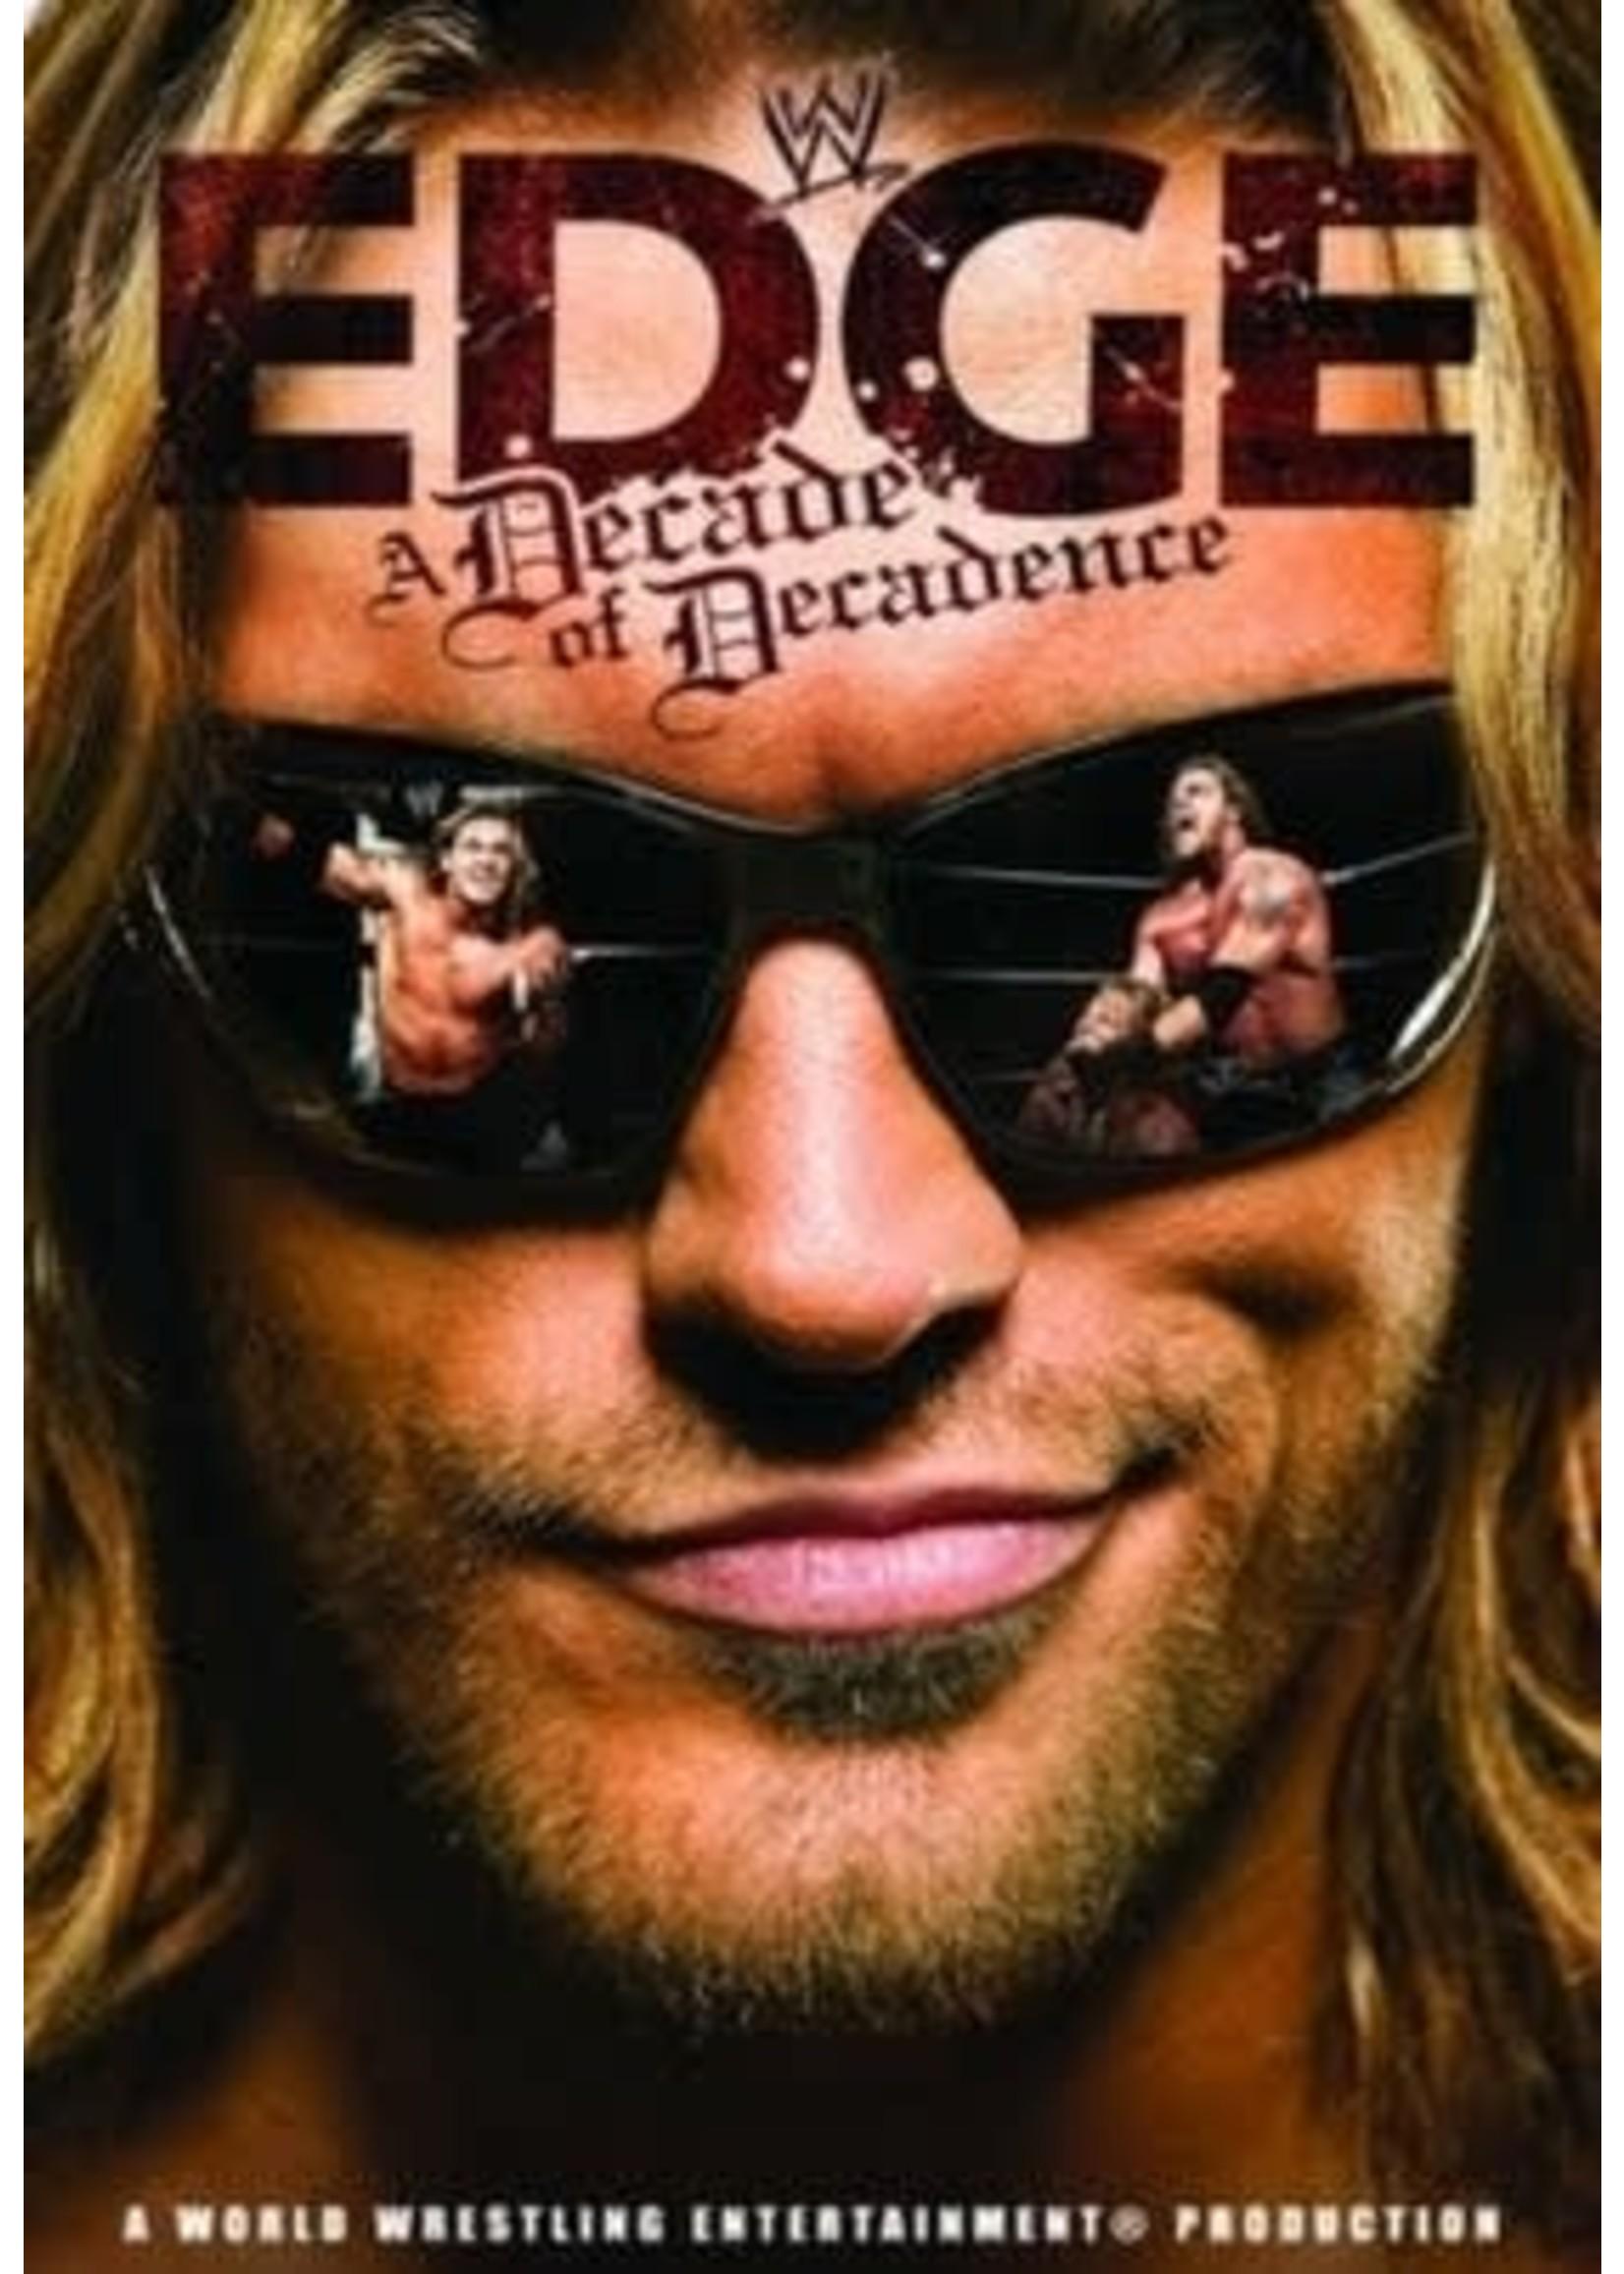 Edge: A Decade of Decadence DVD